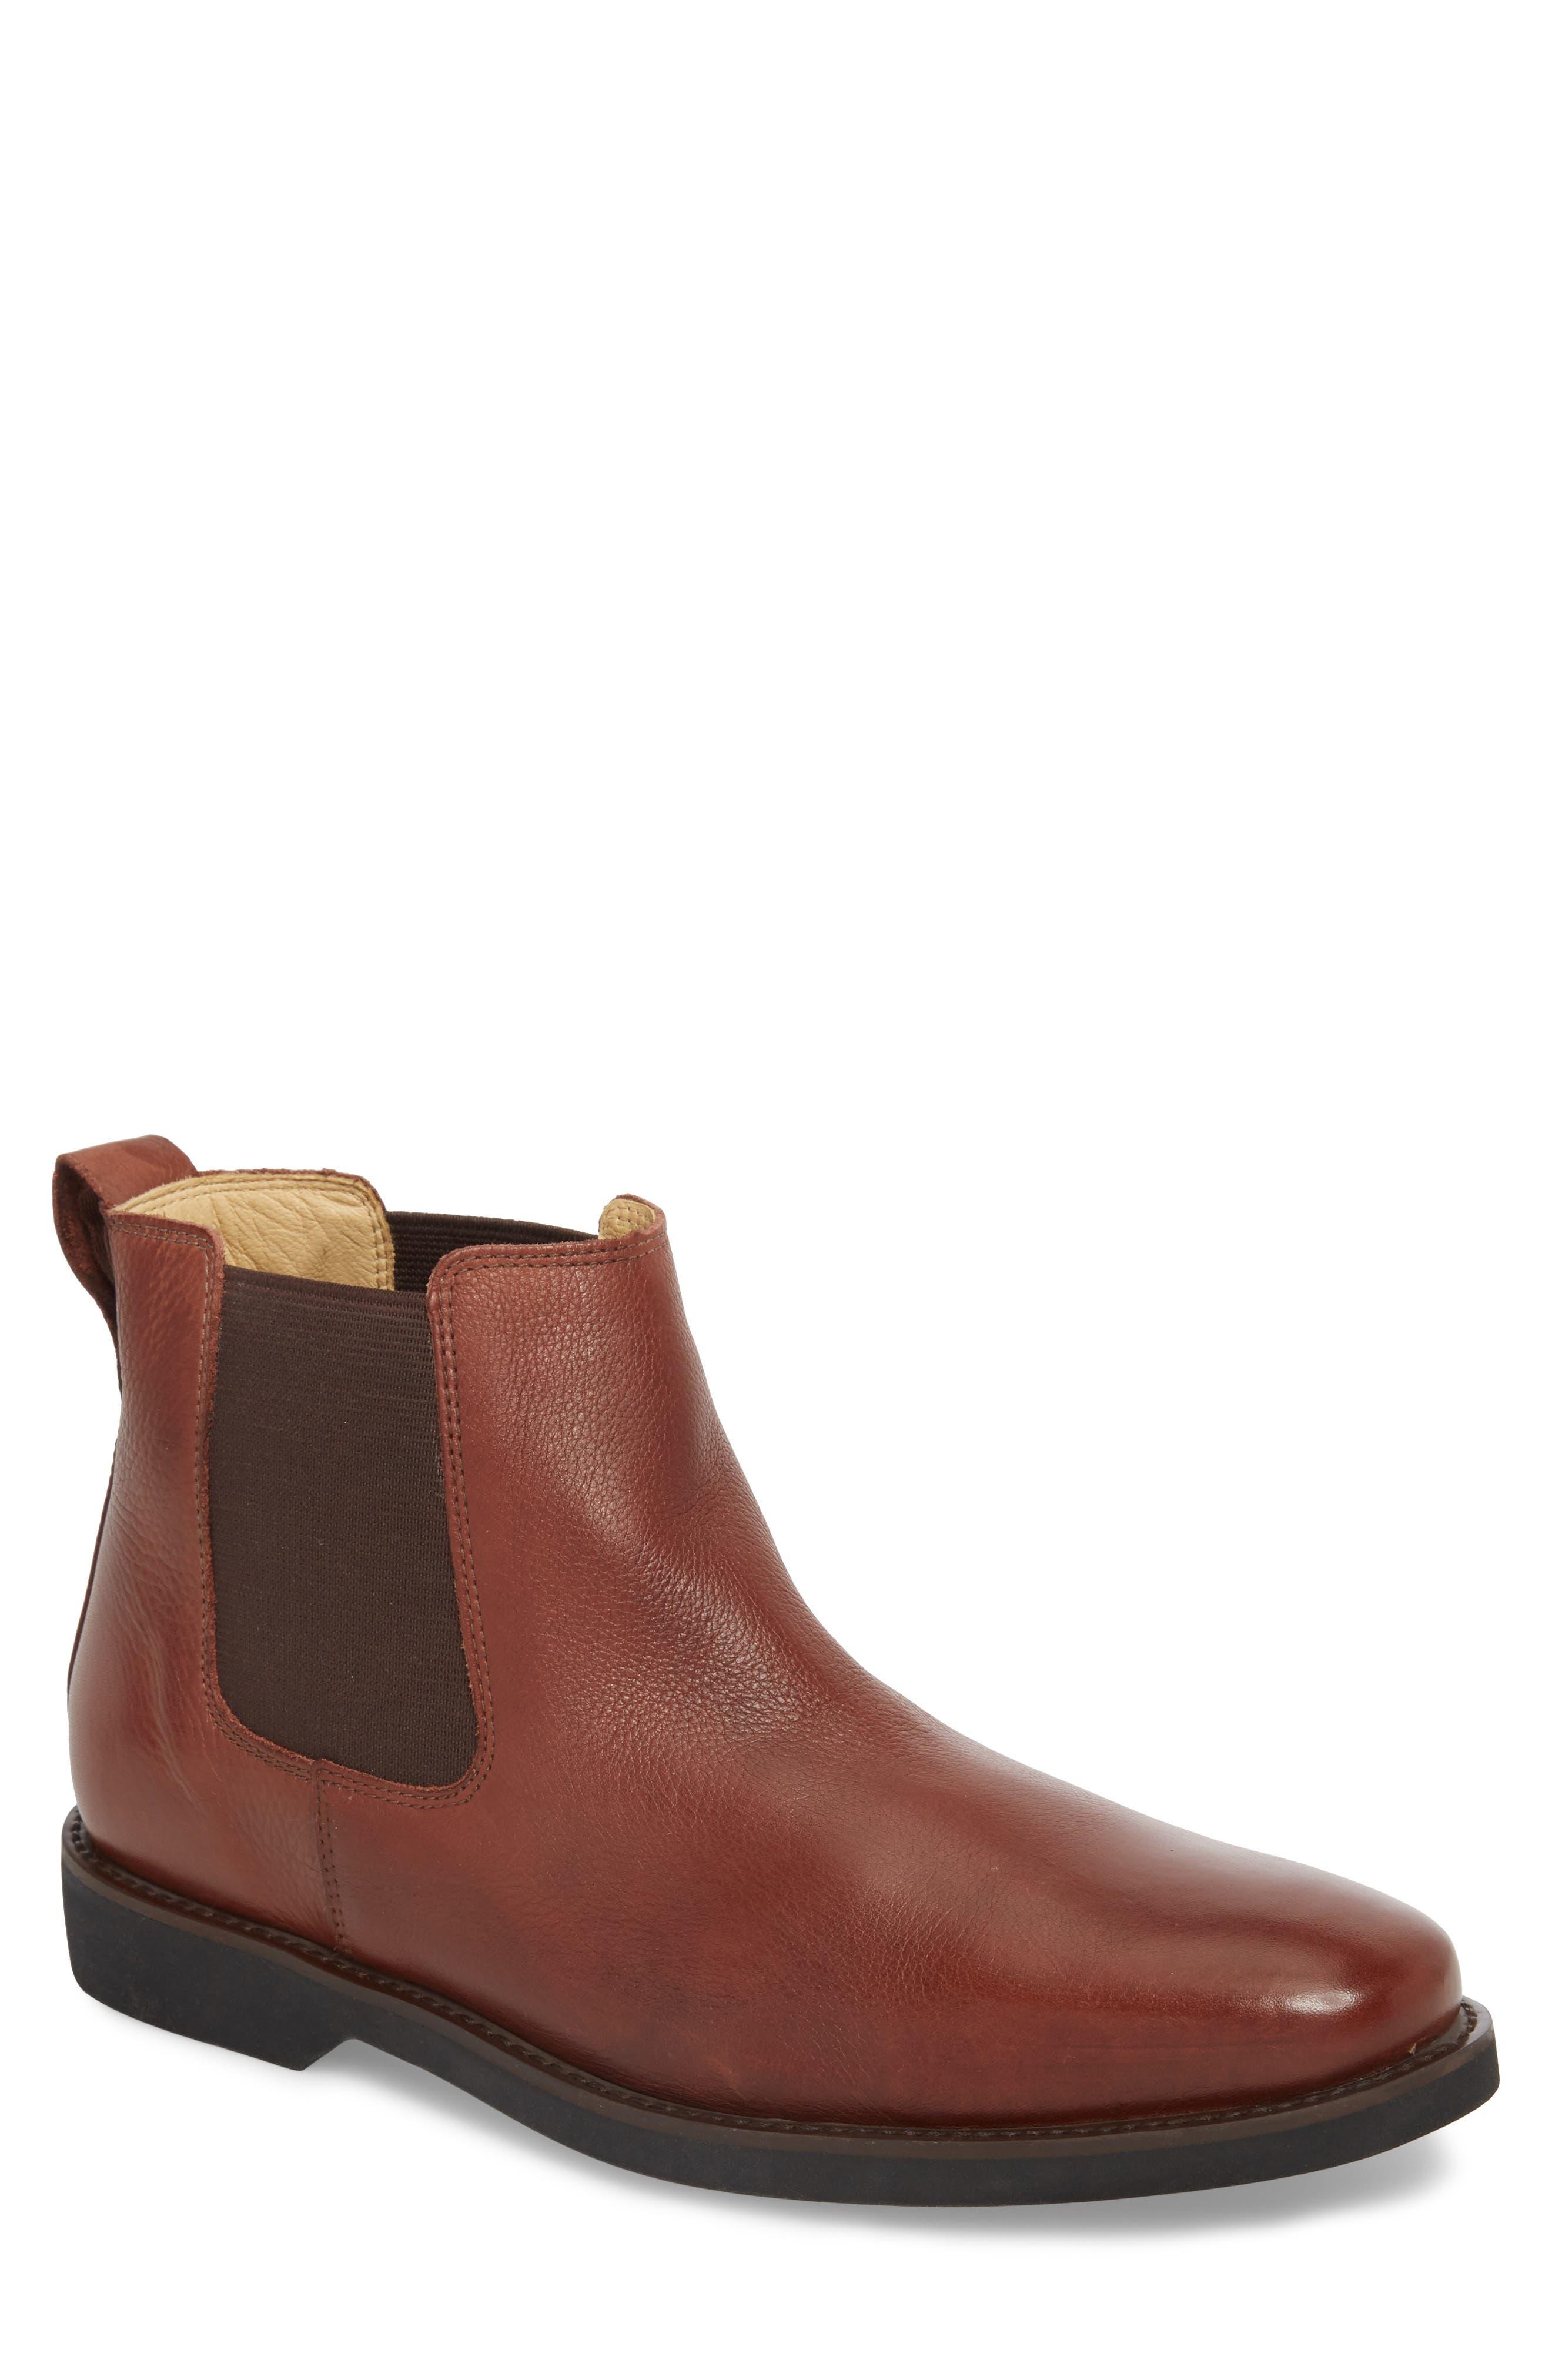 Anatomic & Co. Cardoso Chelsea Boot (Men)